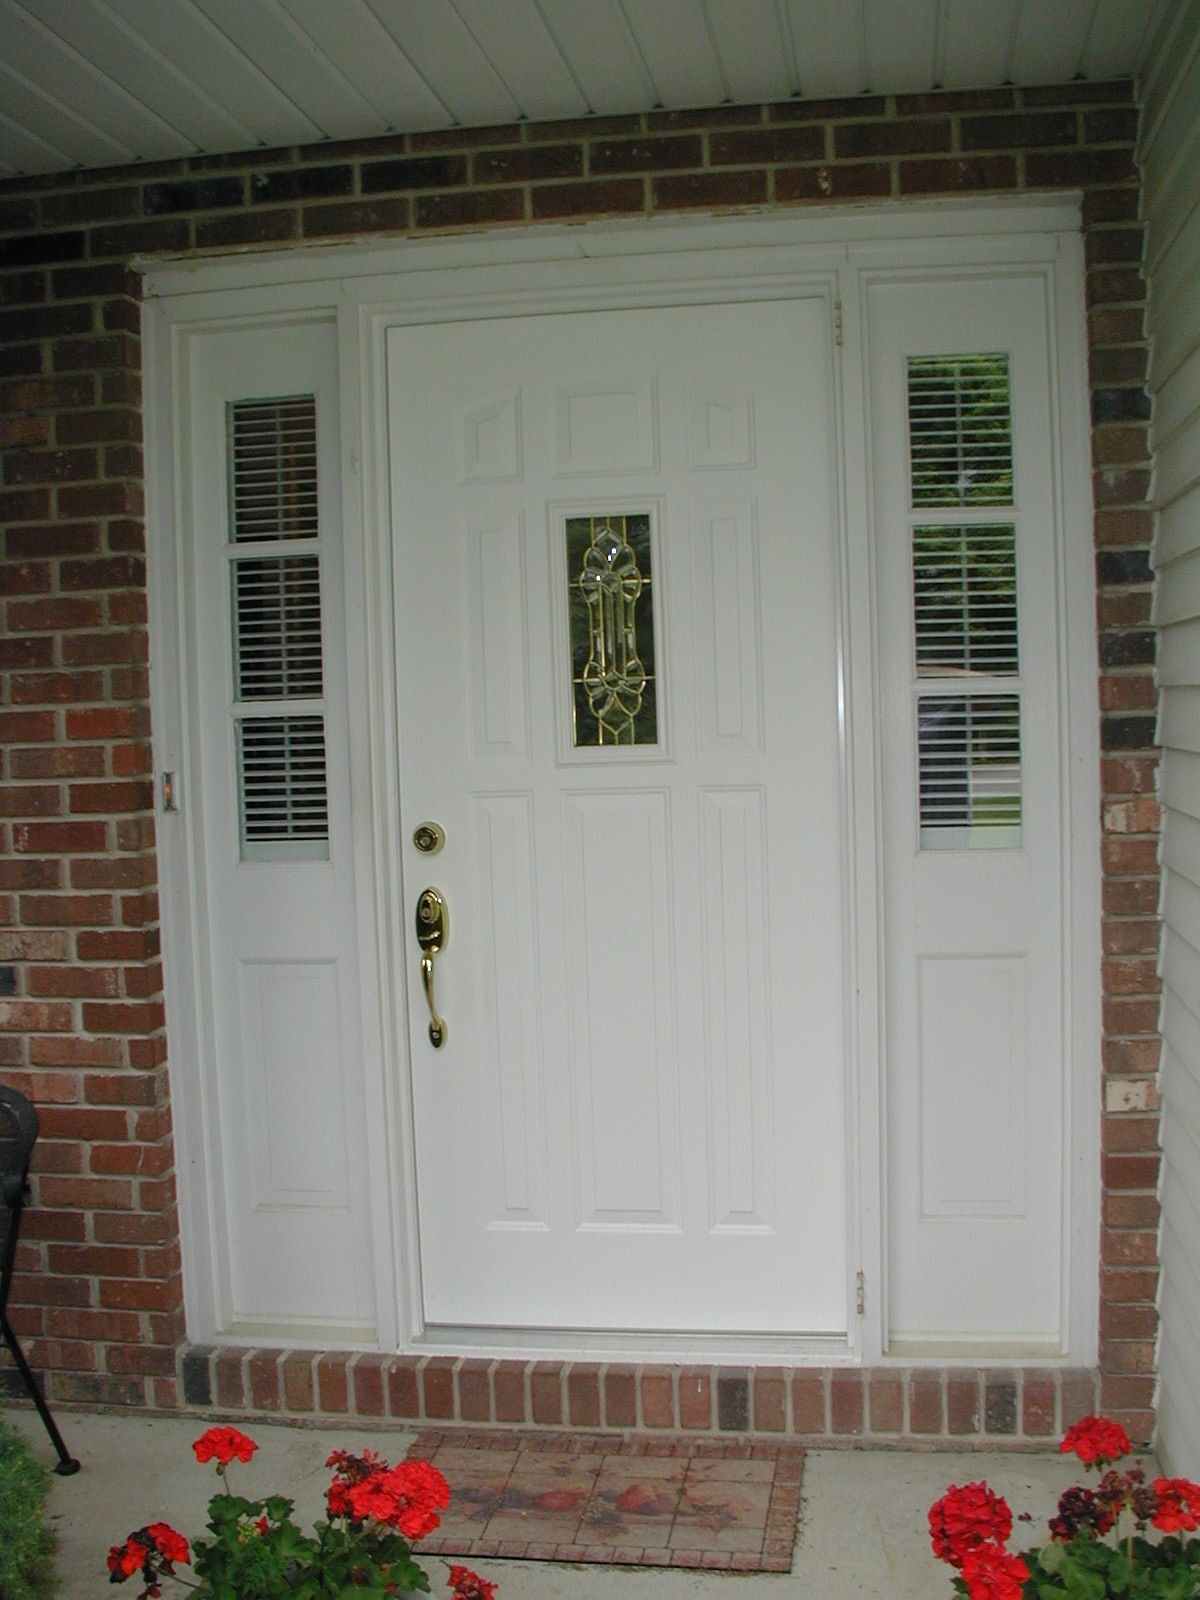 Door With Small Window And Two Sidelites Entry Doors Doors Entry Door Systems